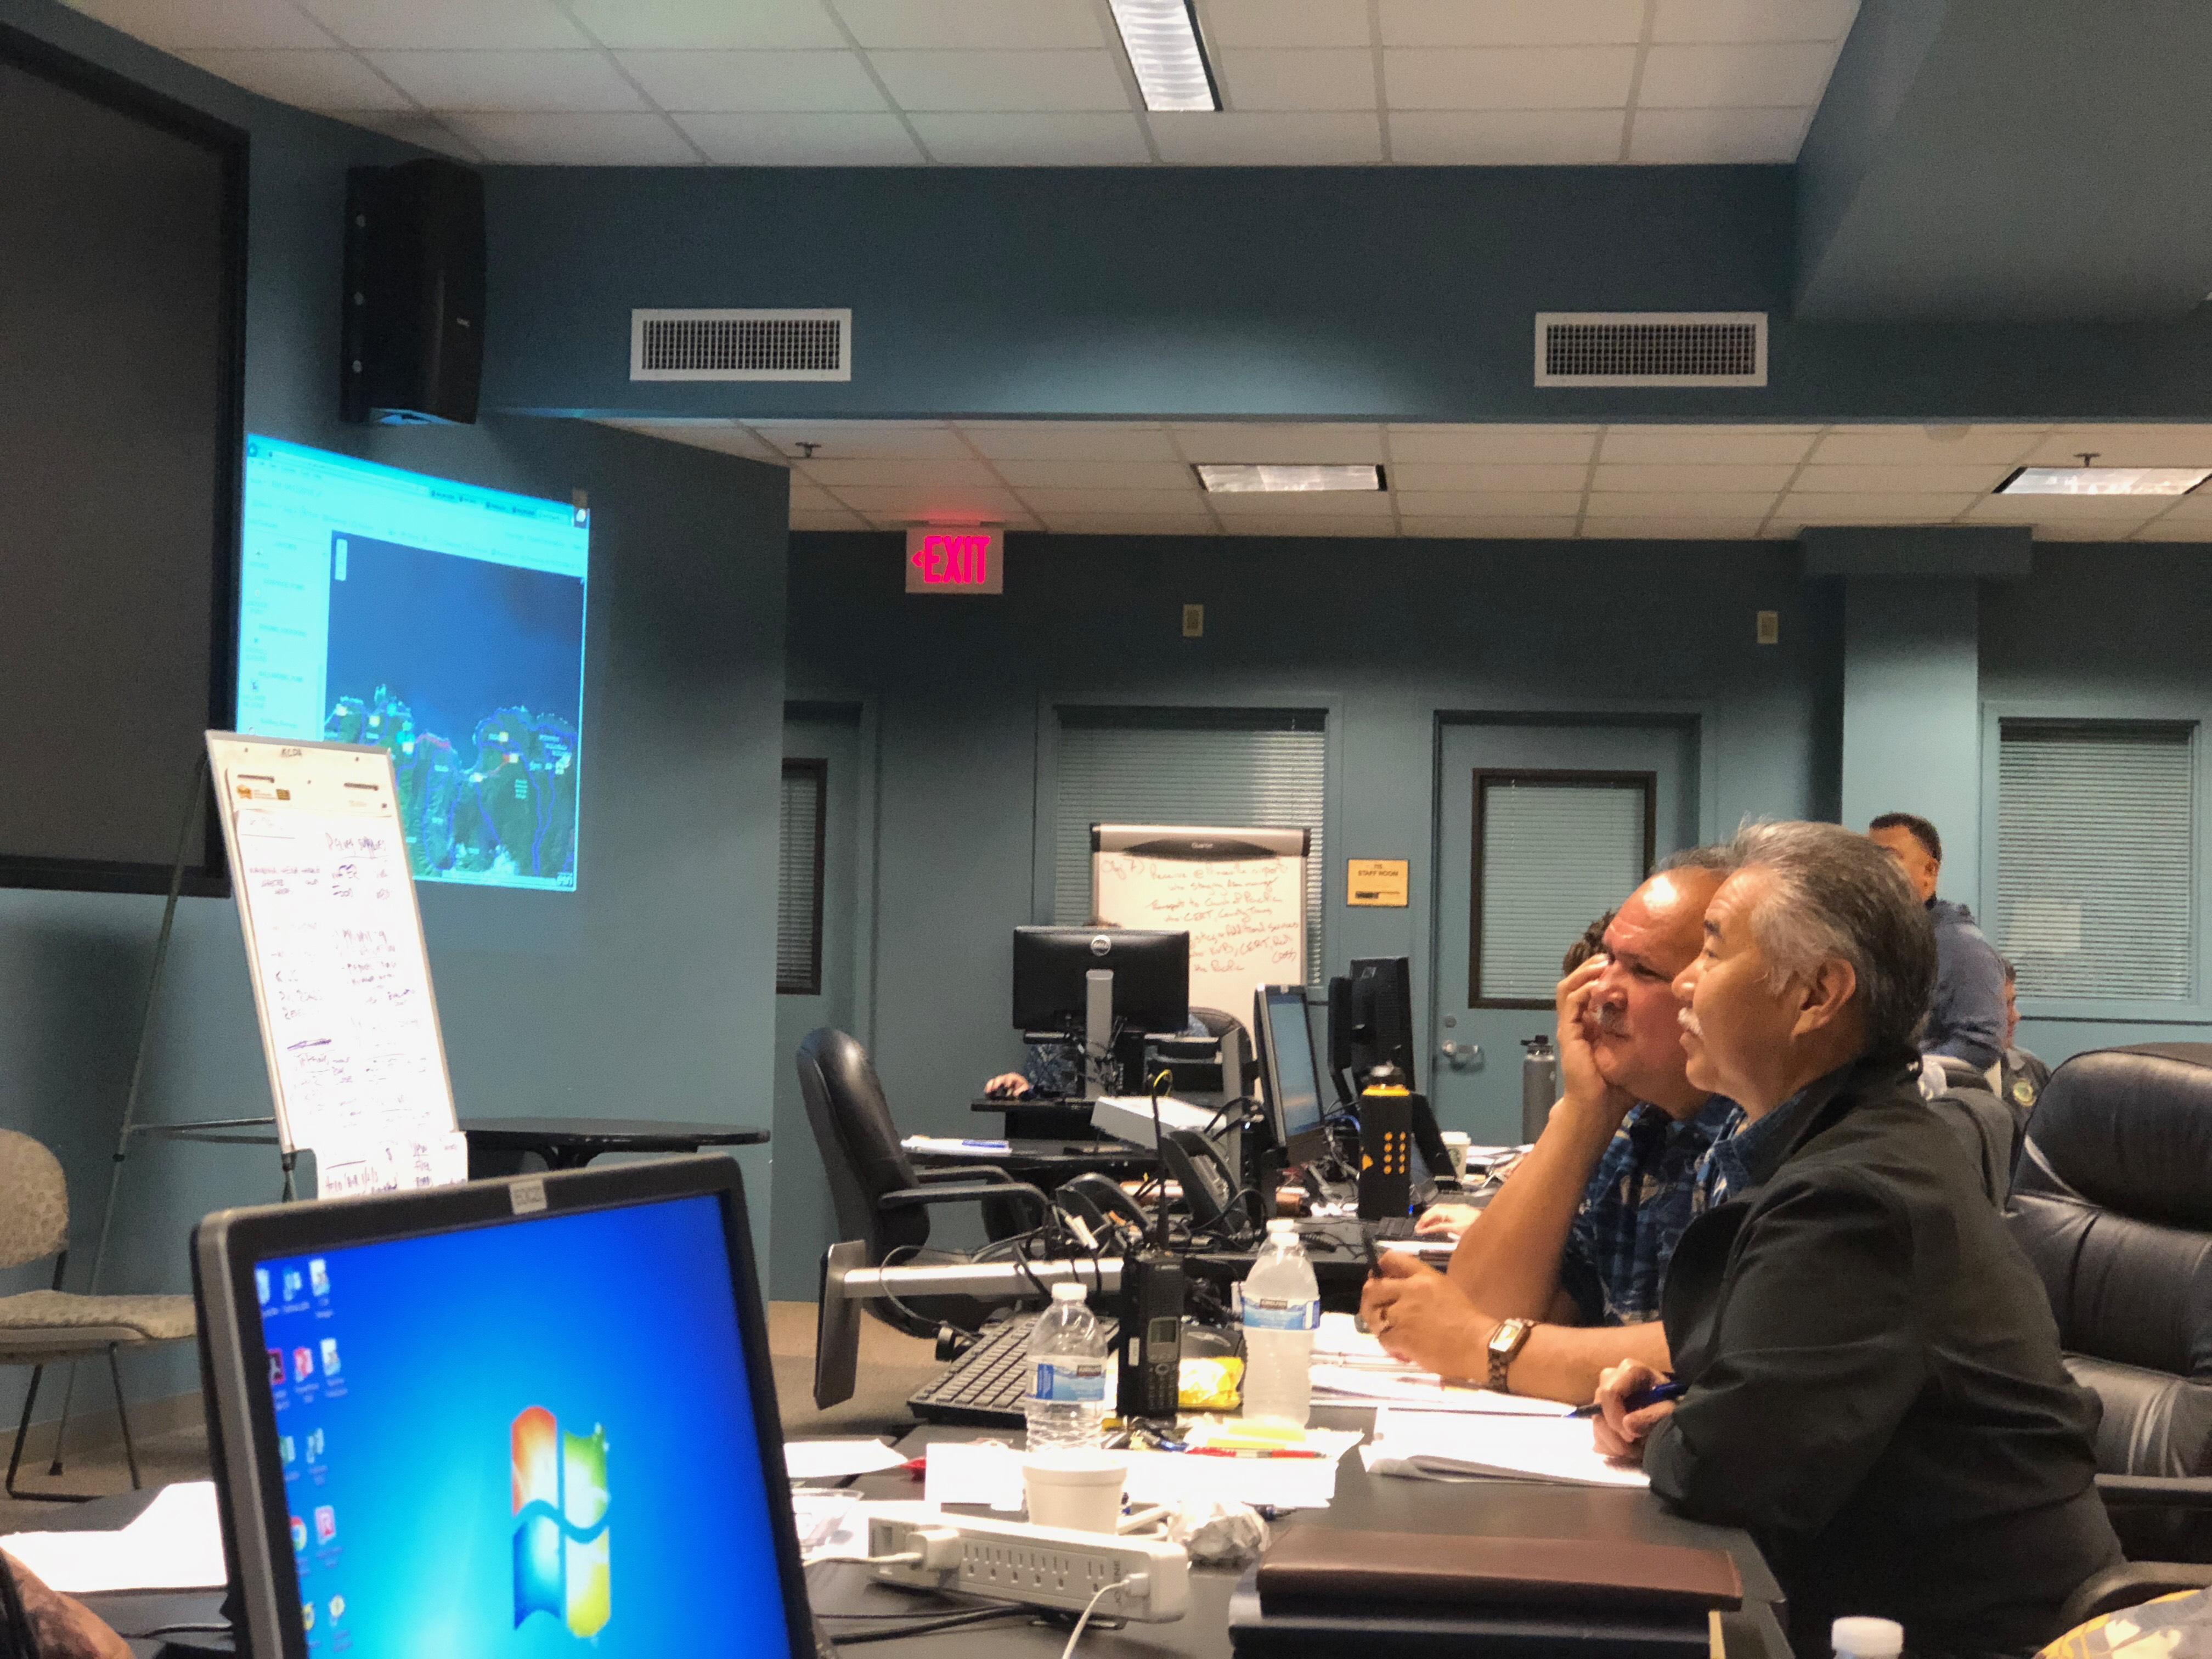 Brown water advisory issued for Kauai - Hawaii News Now